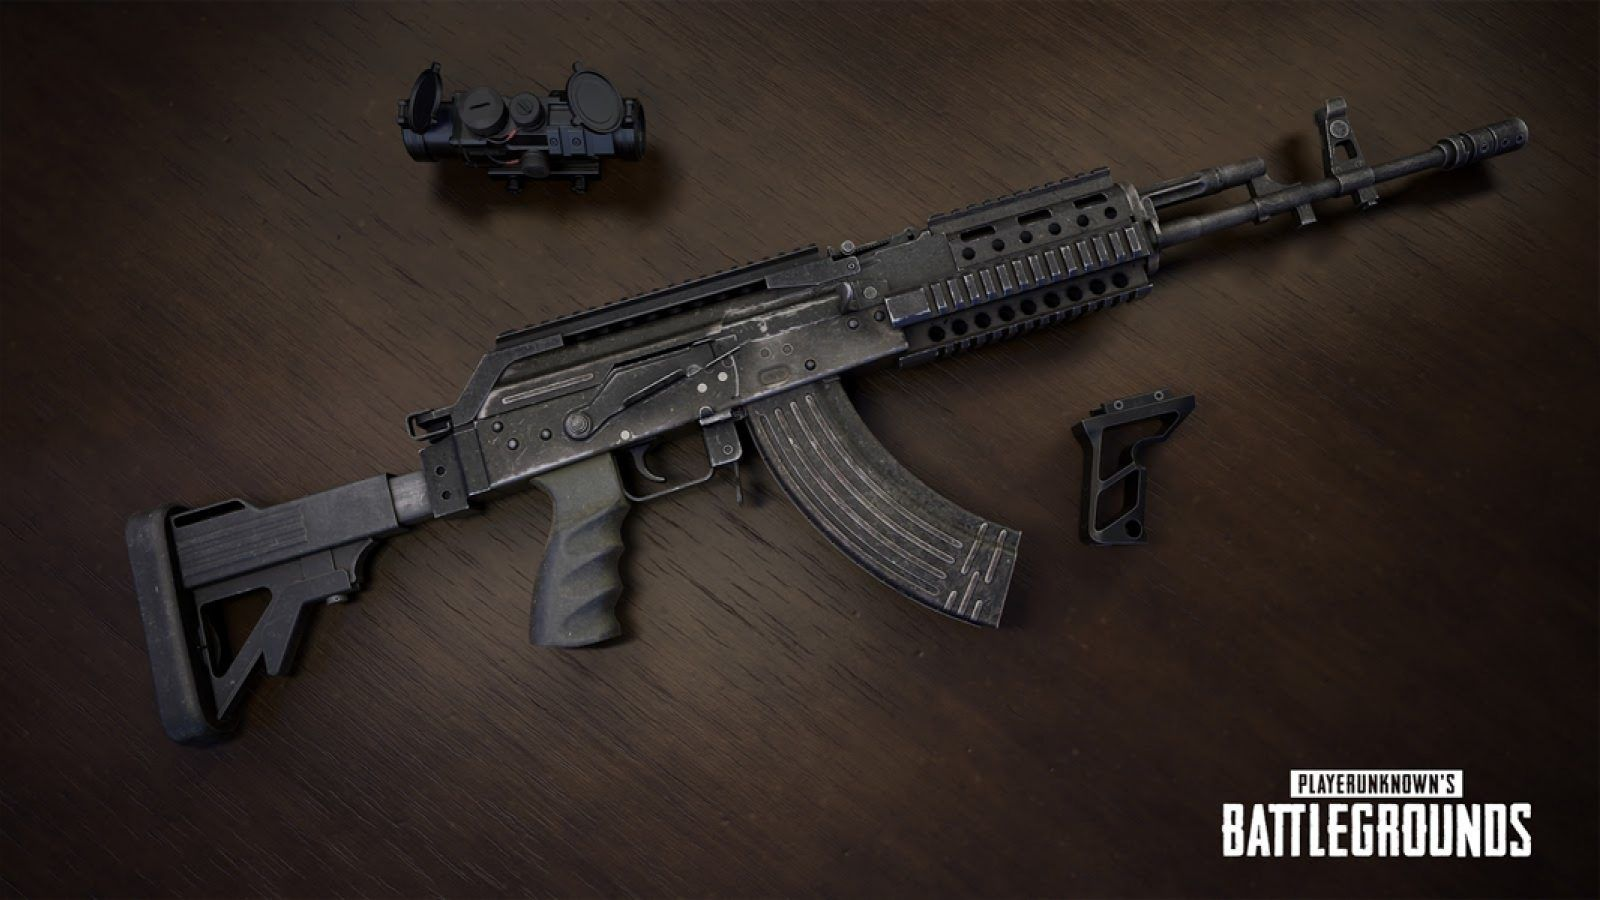 pubg gun 762 ، pubg wallpaper hd ، للتحميل مجانا